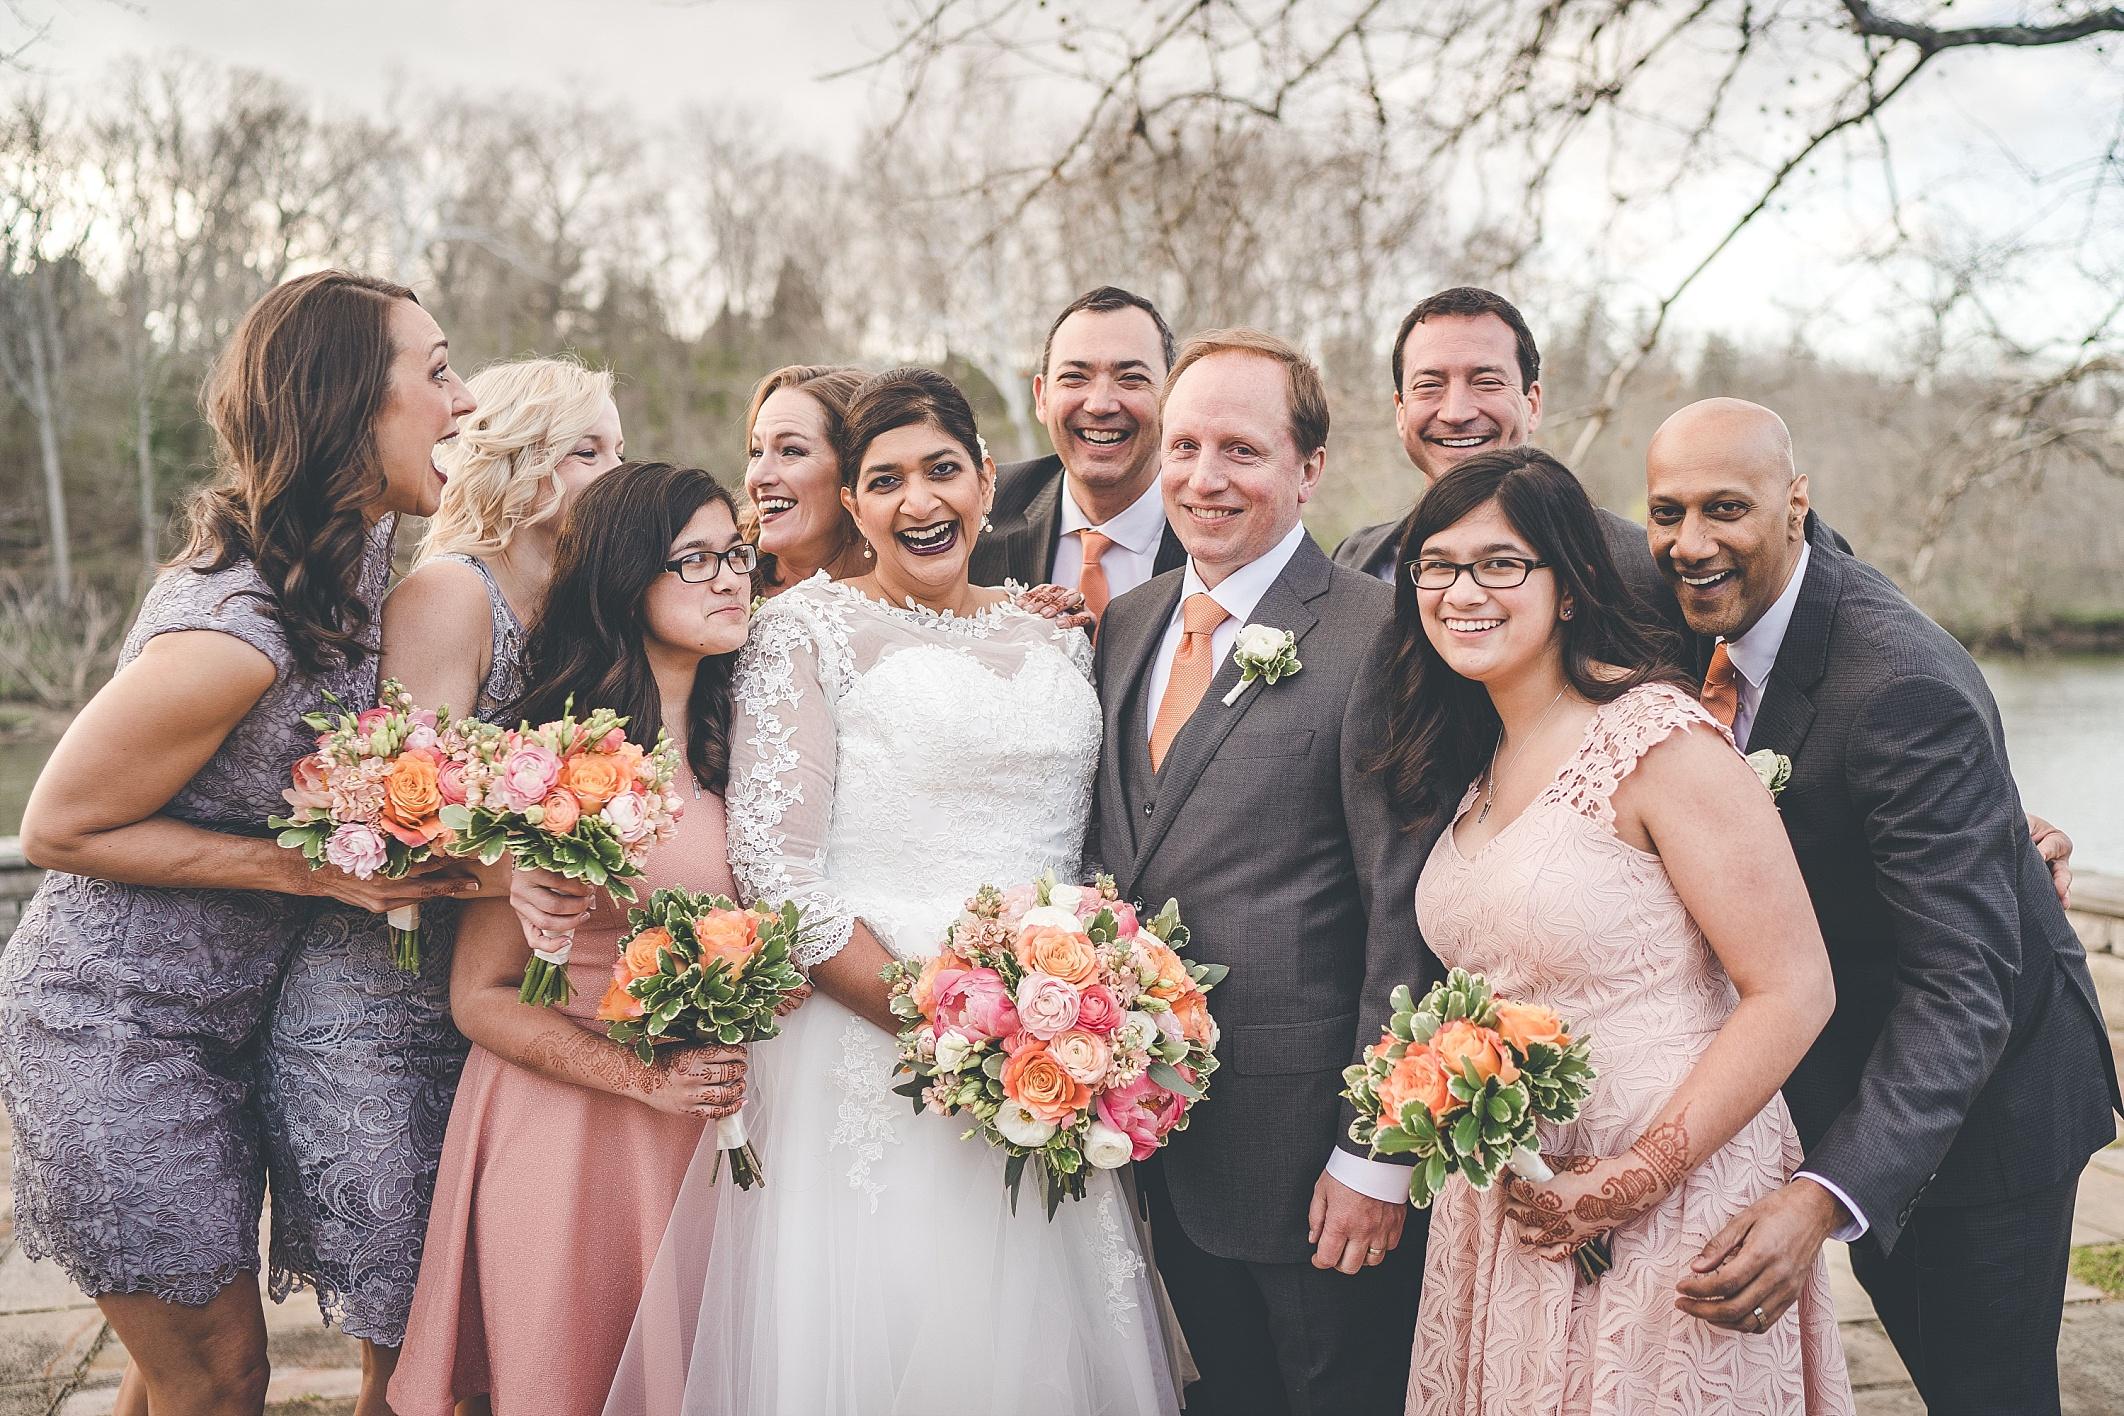 2711_dayton-indian-wedding-photographer-beavercreek_0066.jpg